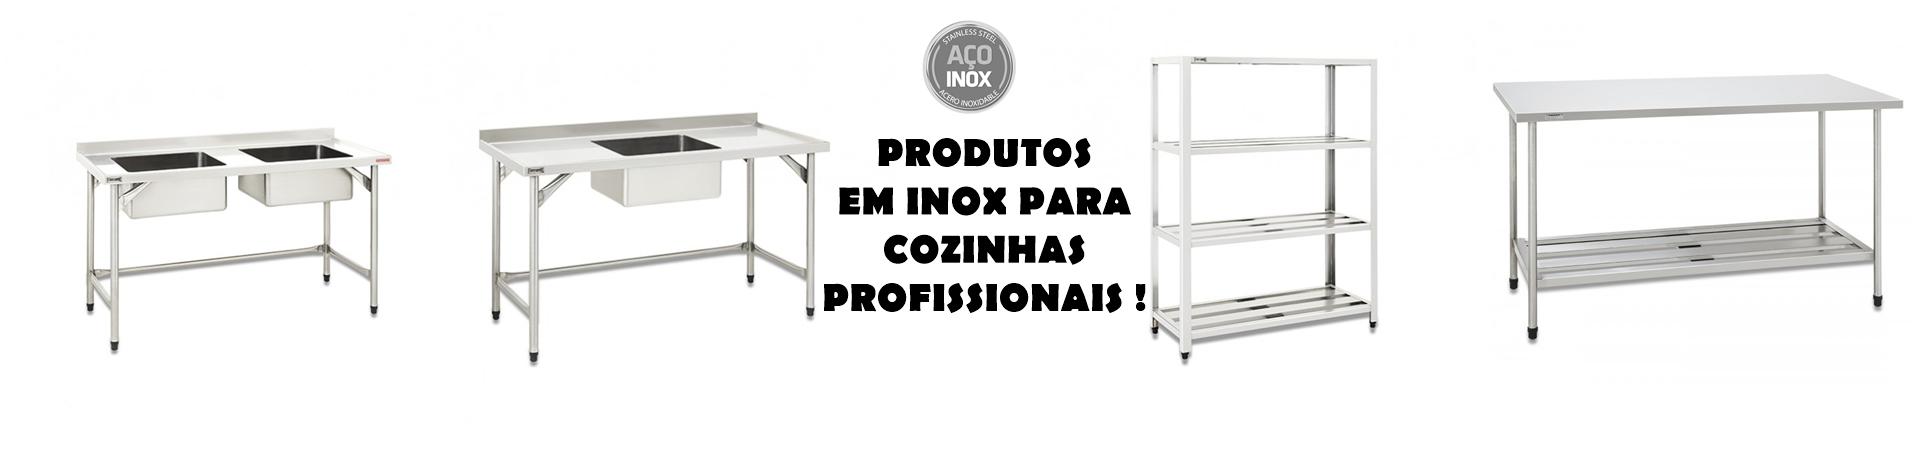 AÇO IOX